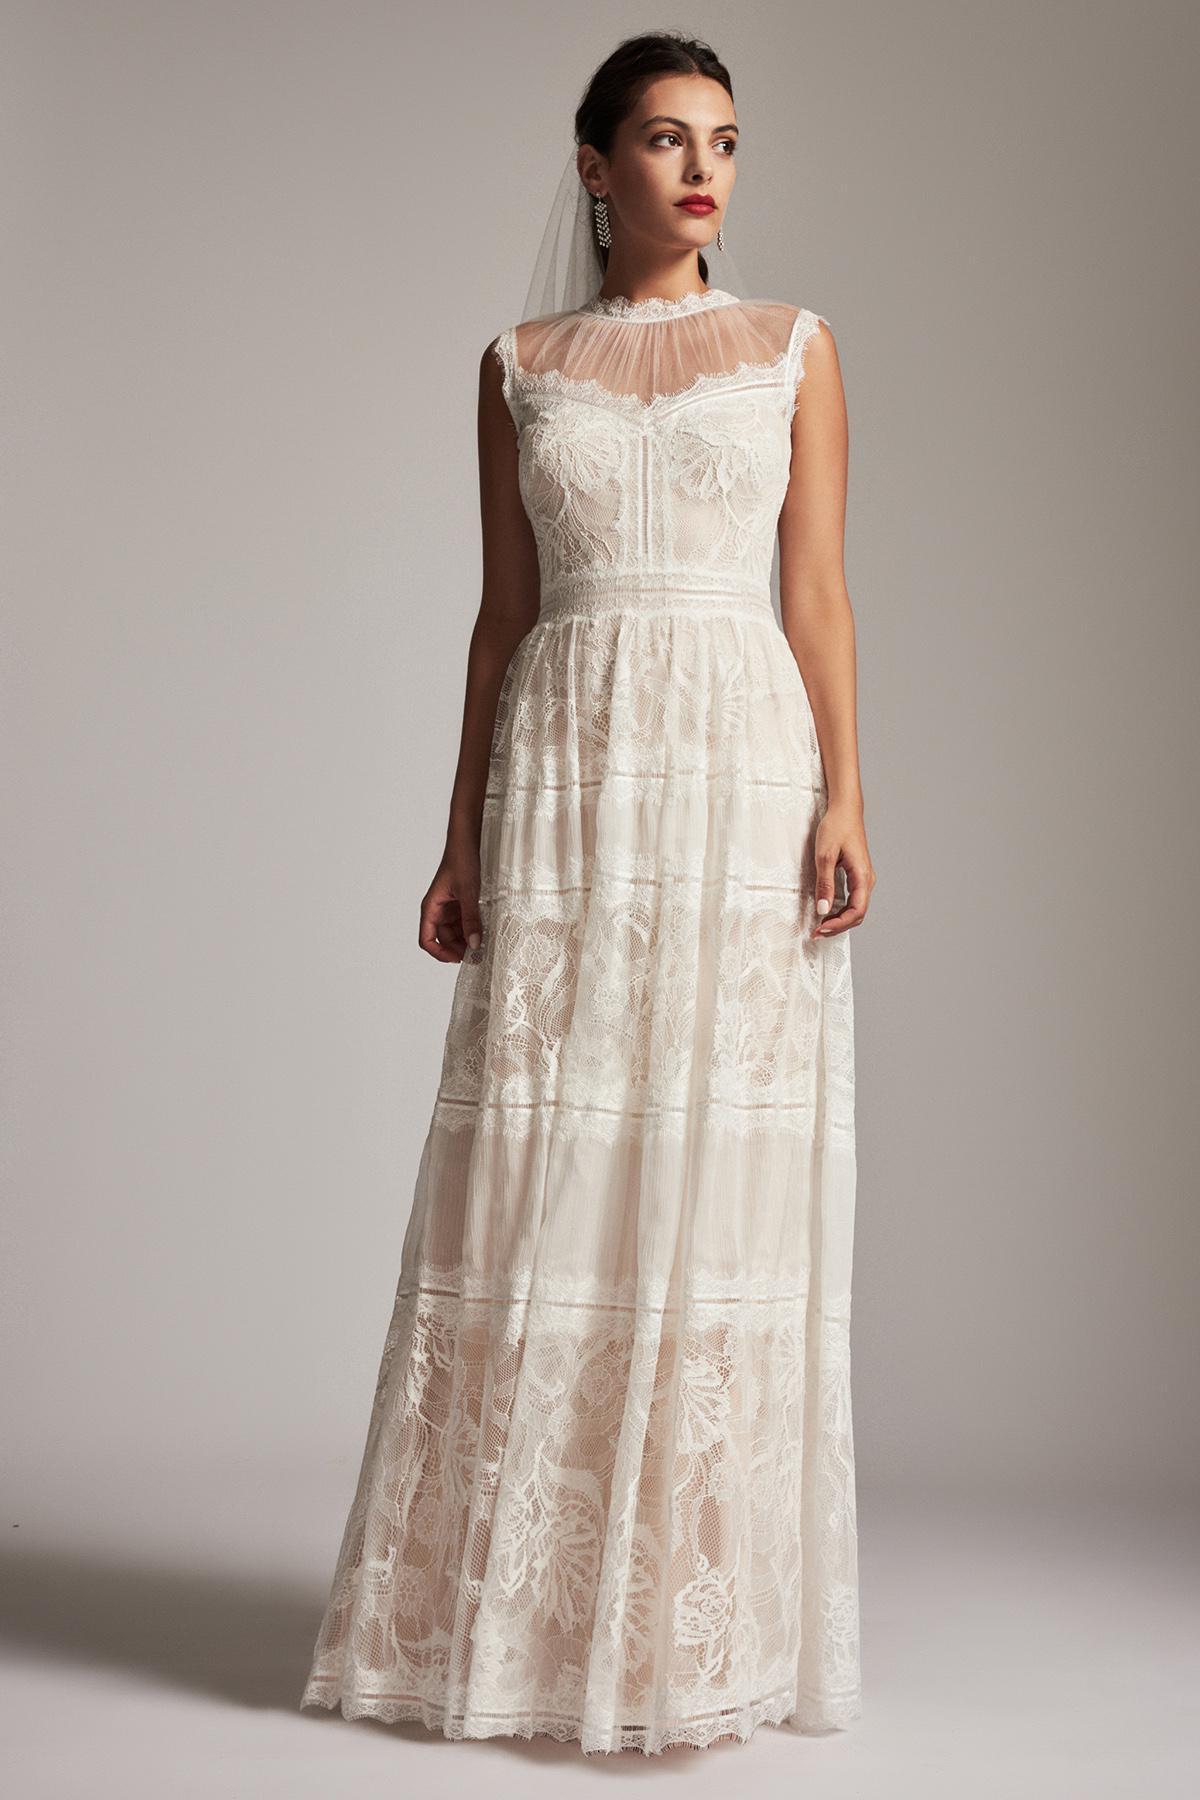 Lyst - Tadashi Shoji Floretta Gown in White